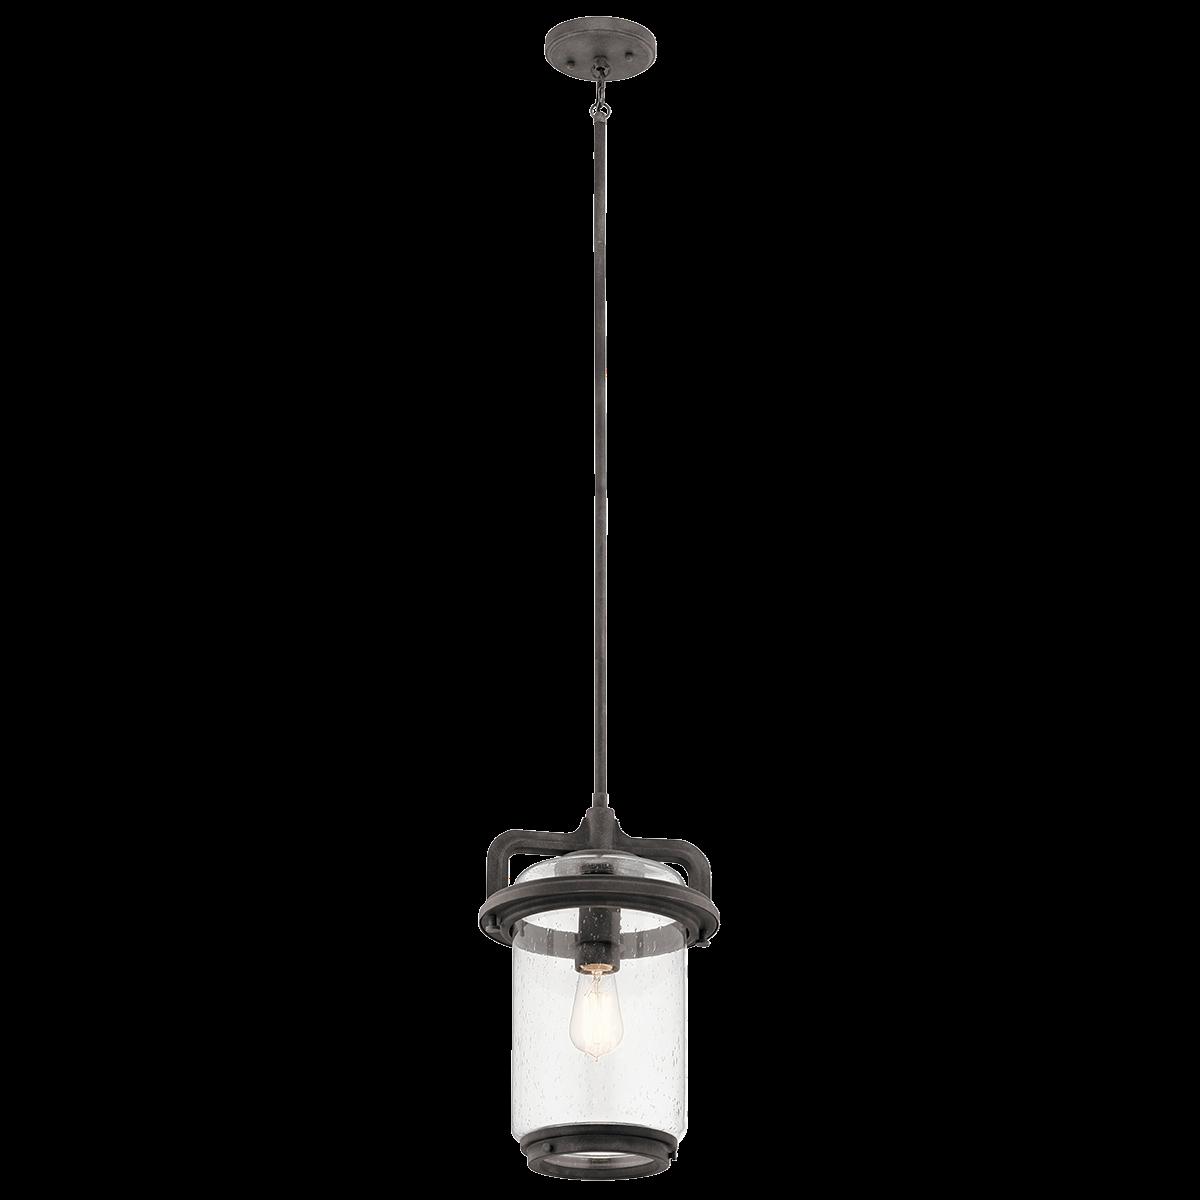 Andover Collection; Andover 1 Light Outdoor Pendant WZC